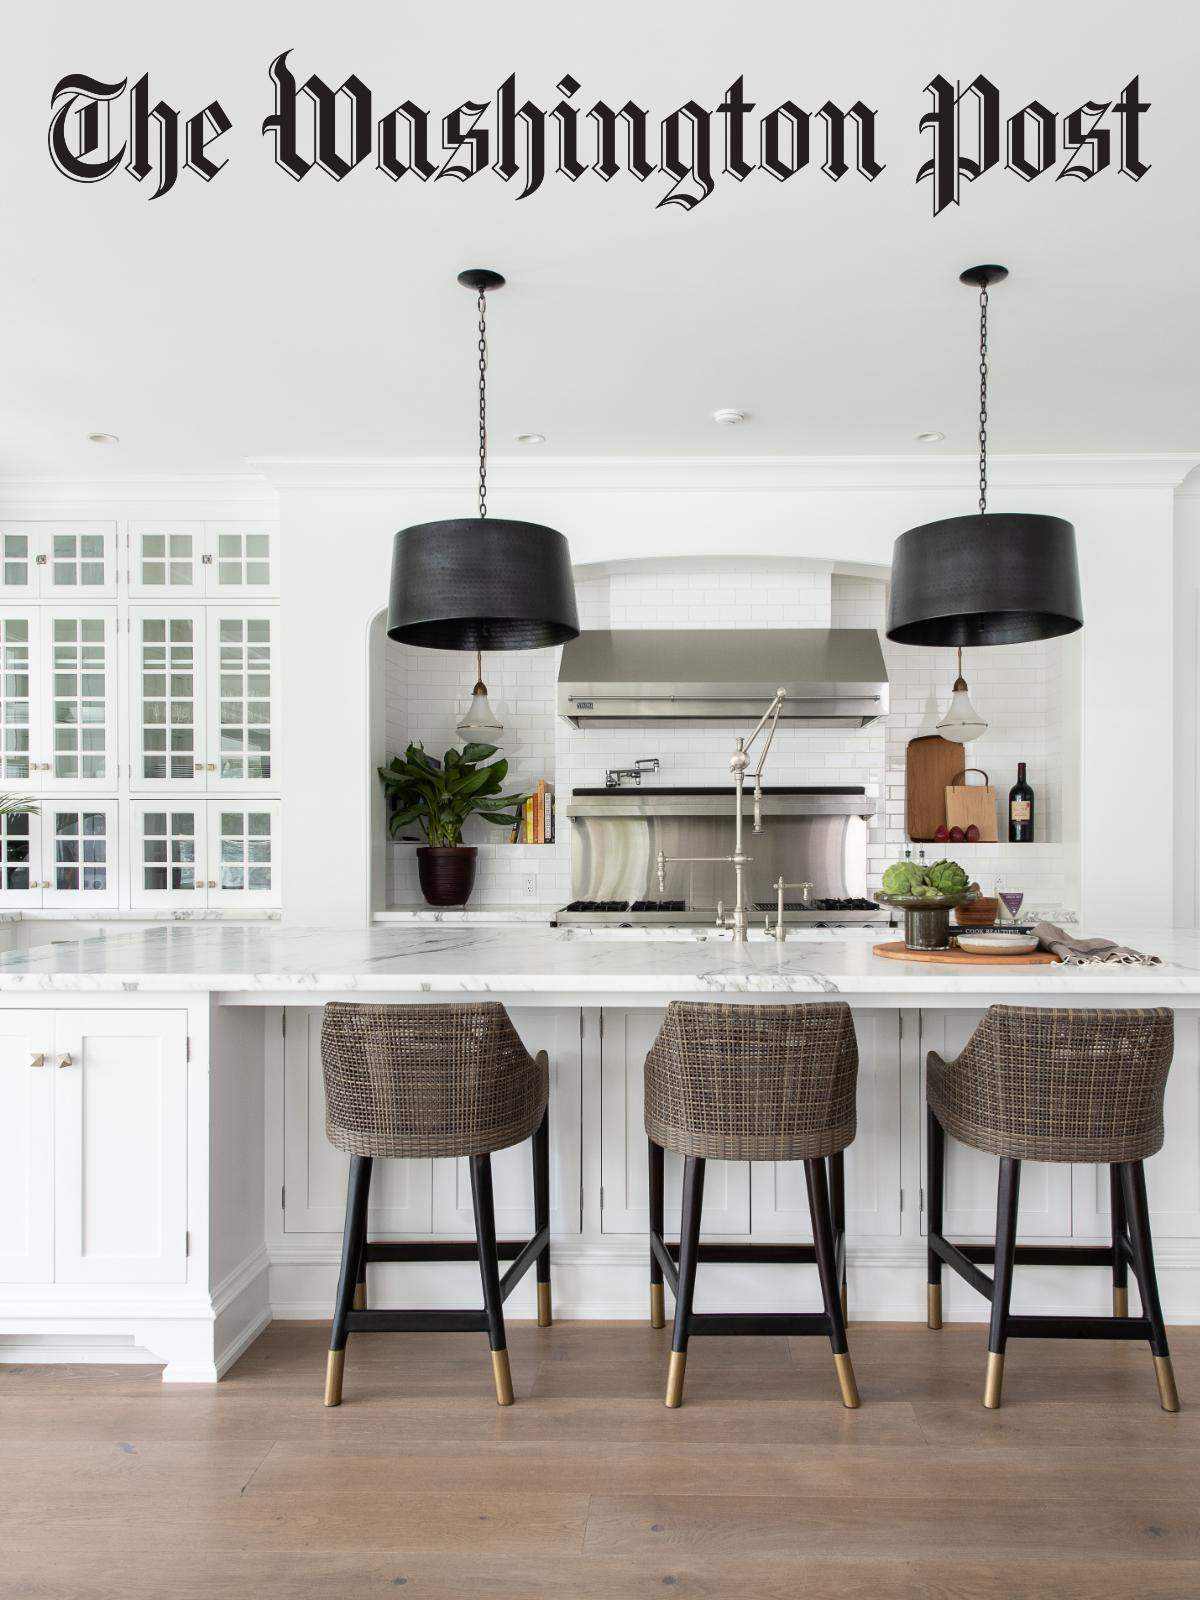 Blackband_Design_Washington_Post_Timeless_Kitchens_Cover_2021